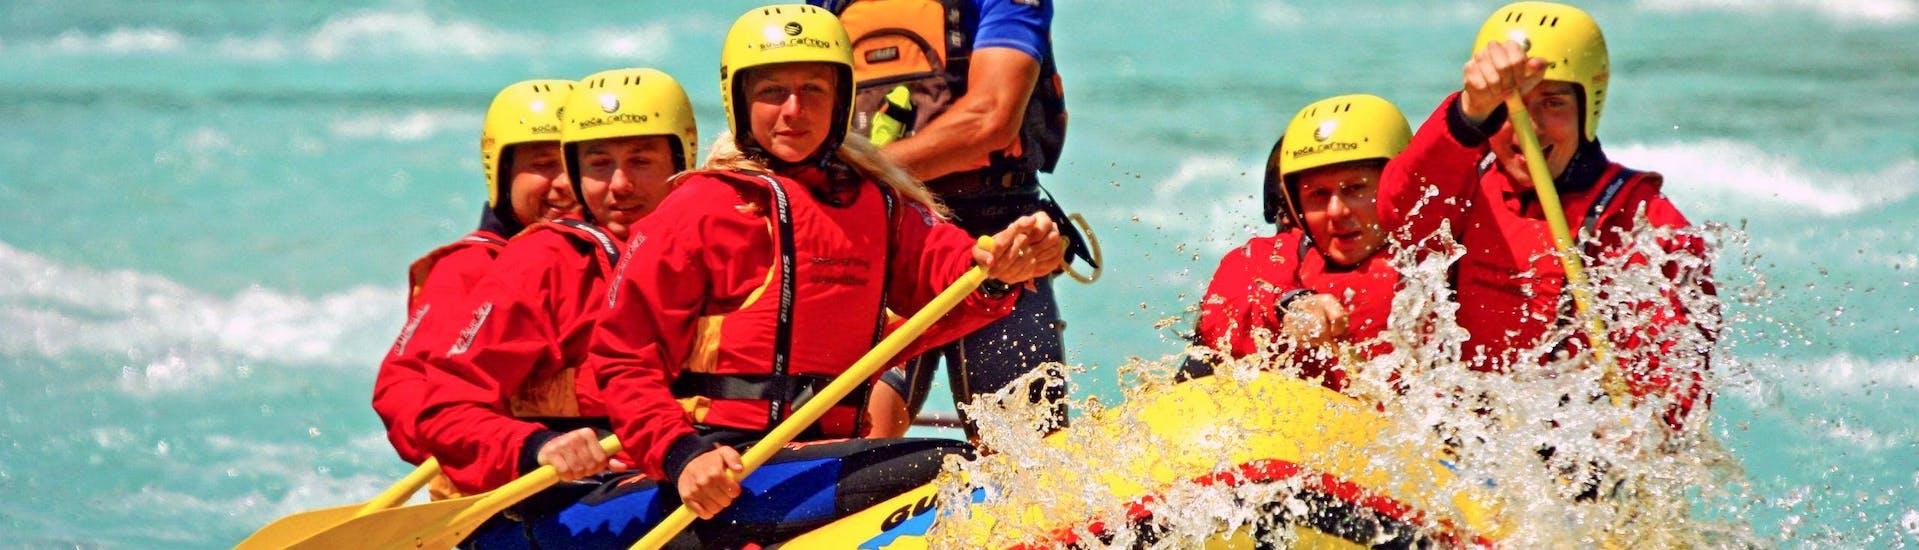 Rafting on the Soča River - Classic Tour